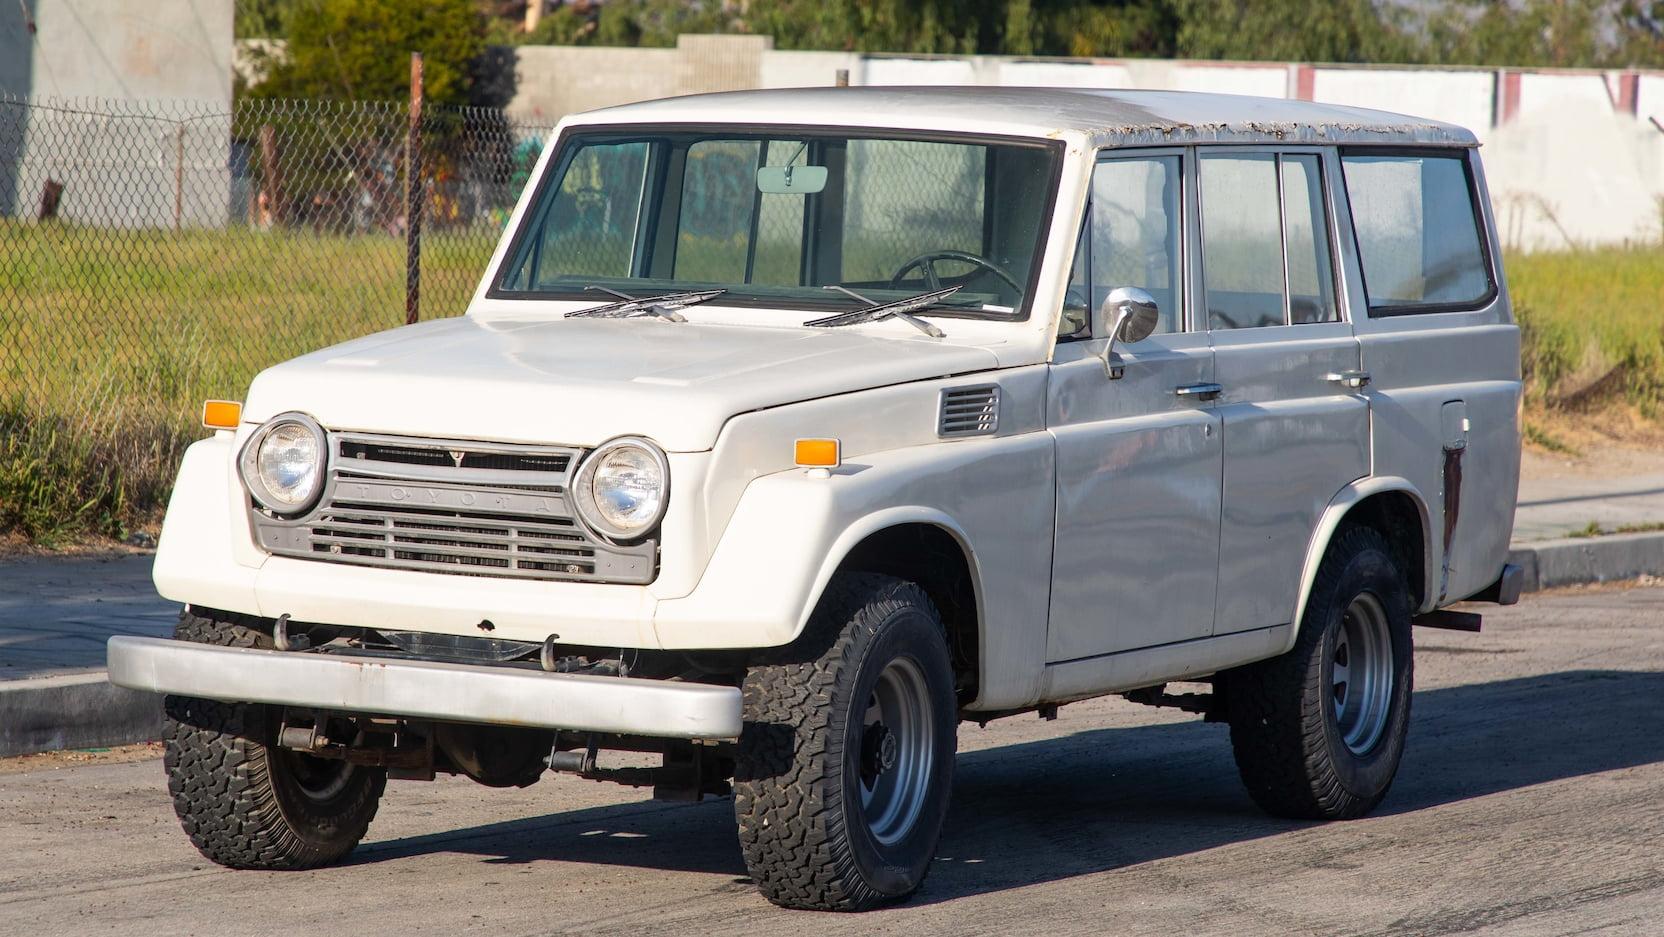 1970 Toyota FJ-55 Land Cruiser